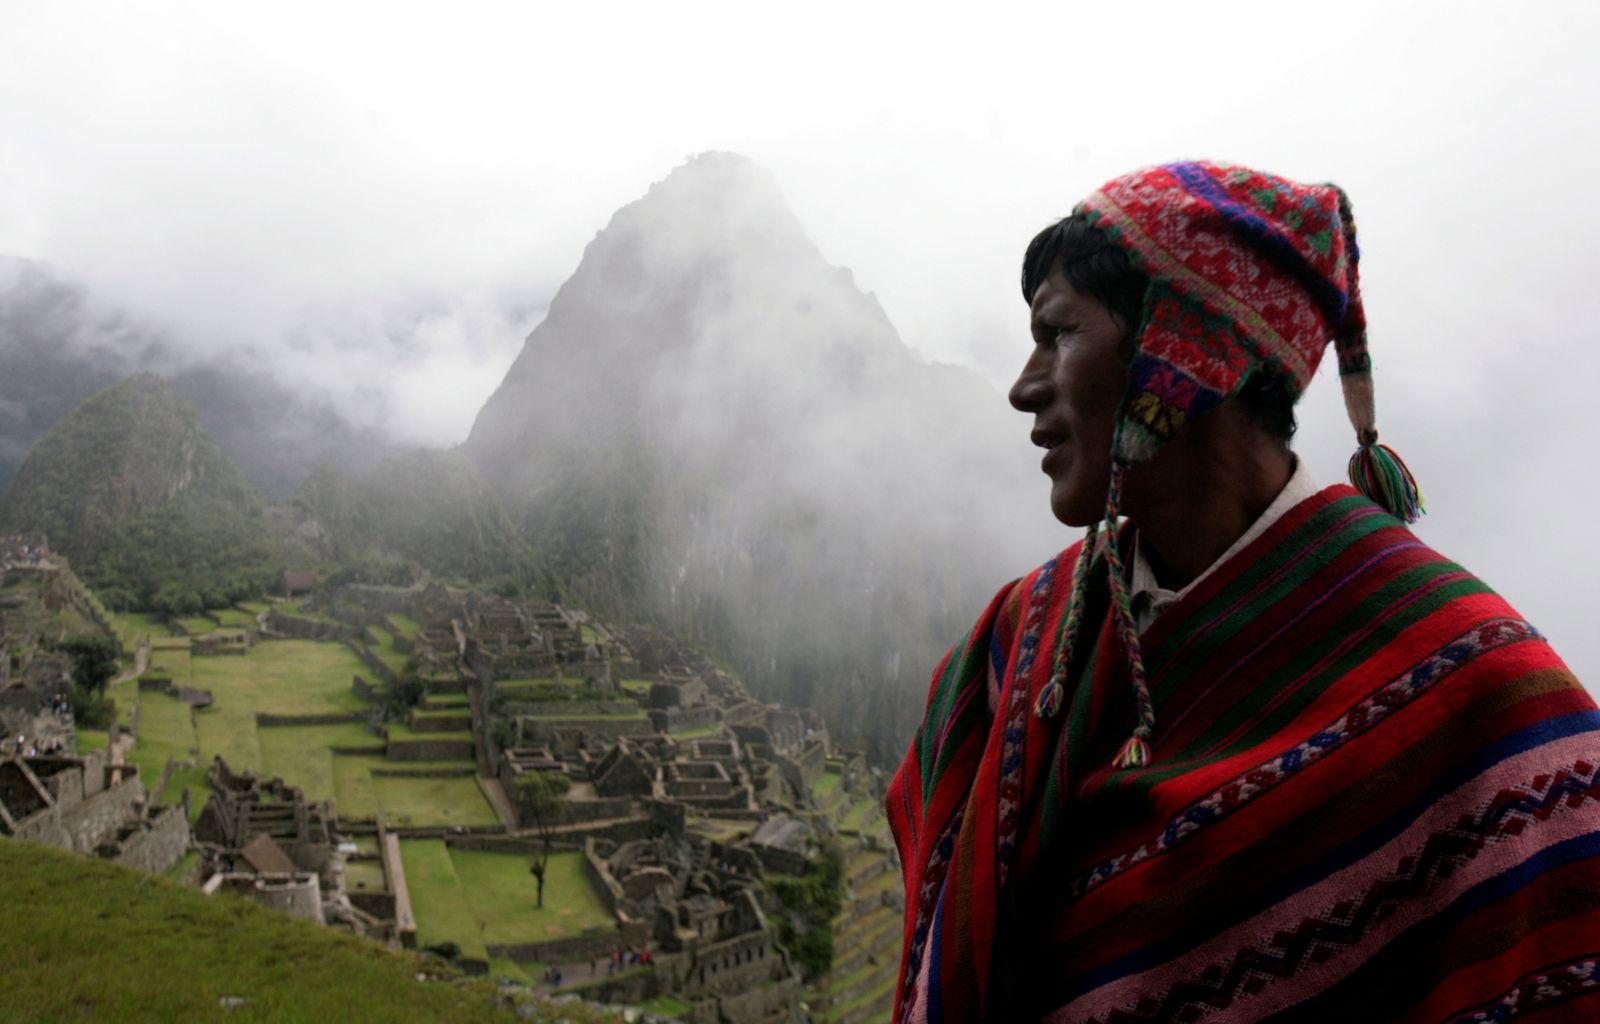 FILE PHOTO: A Quechua musicians stands next to Machu Picchu ruins